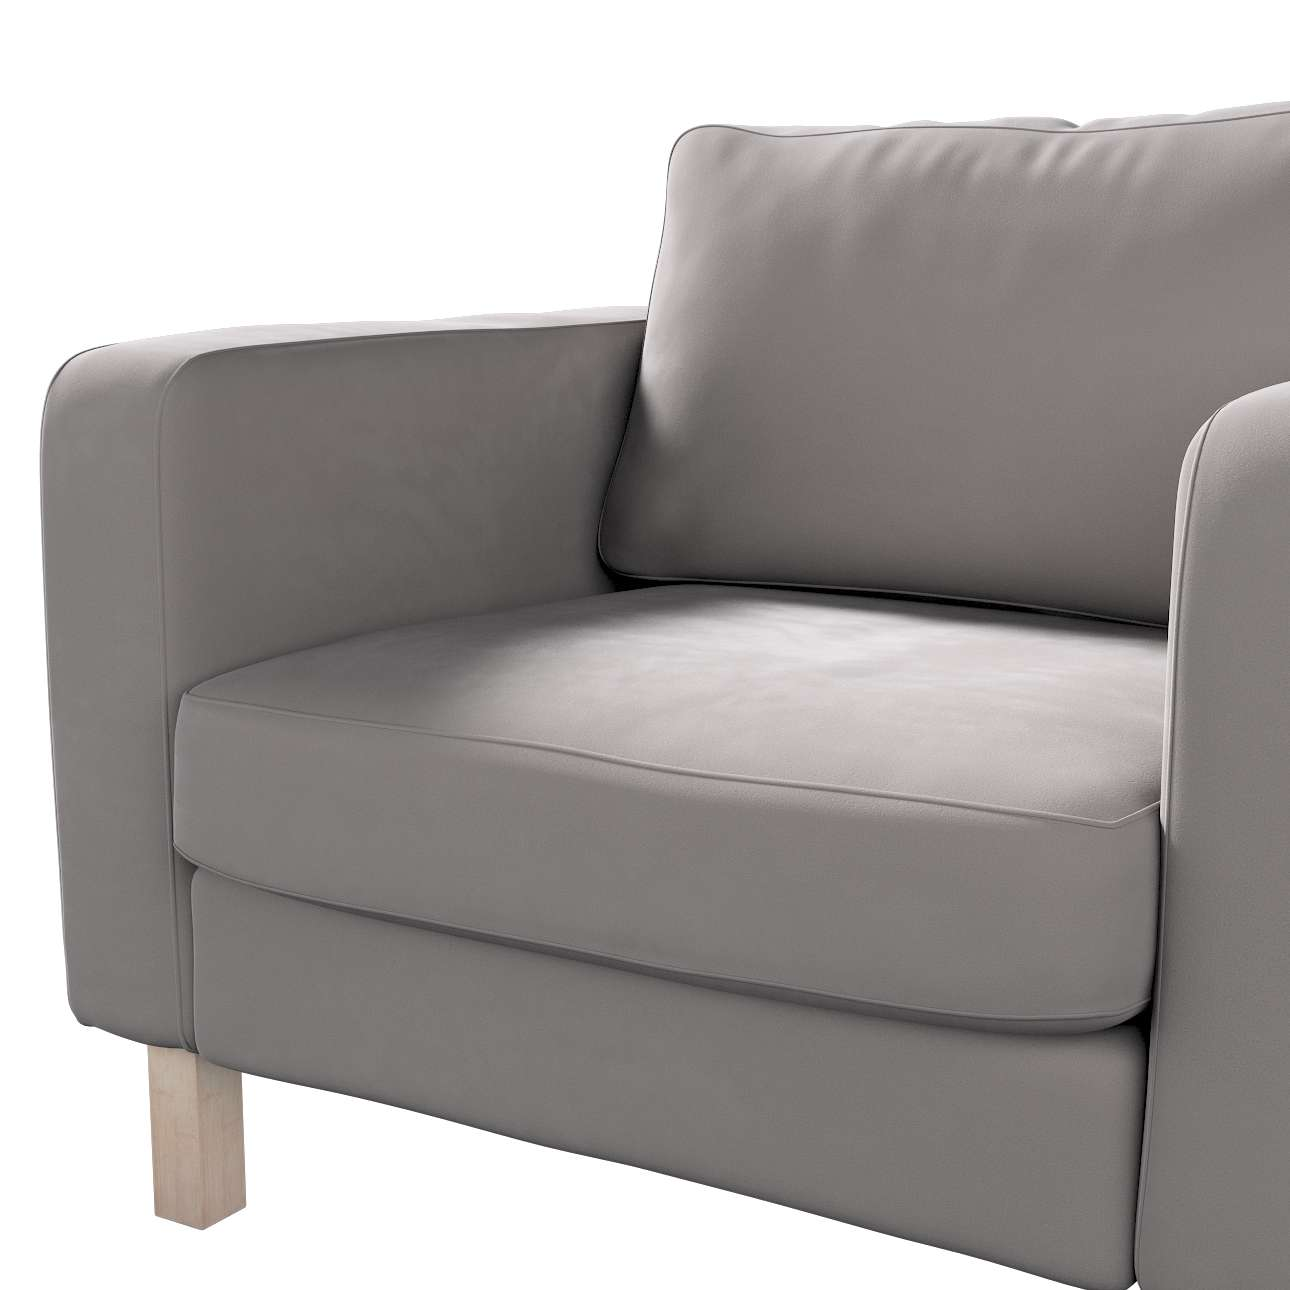 Pokrowiec na fotel Karlstad, krótki w kolekcji Velvet, tkanina: 704-11